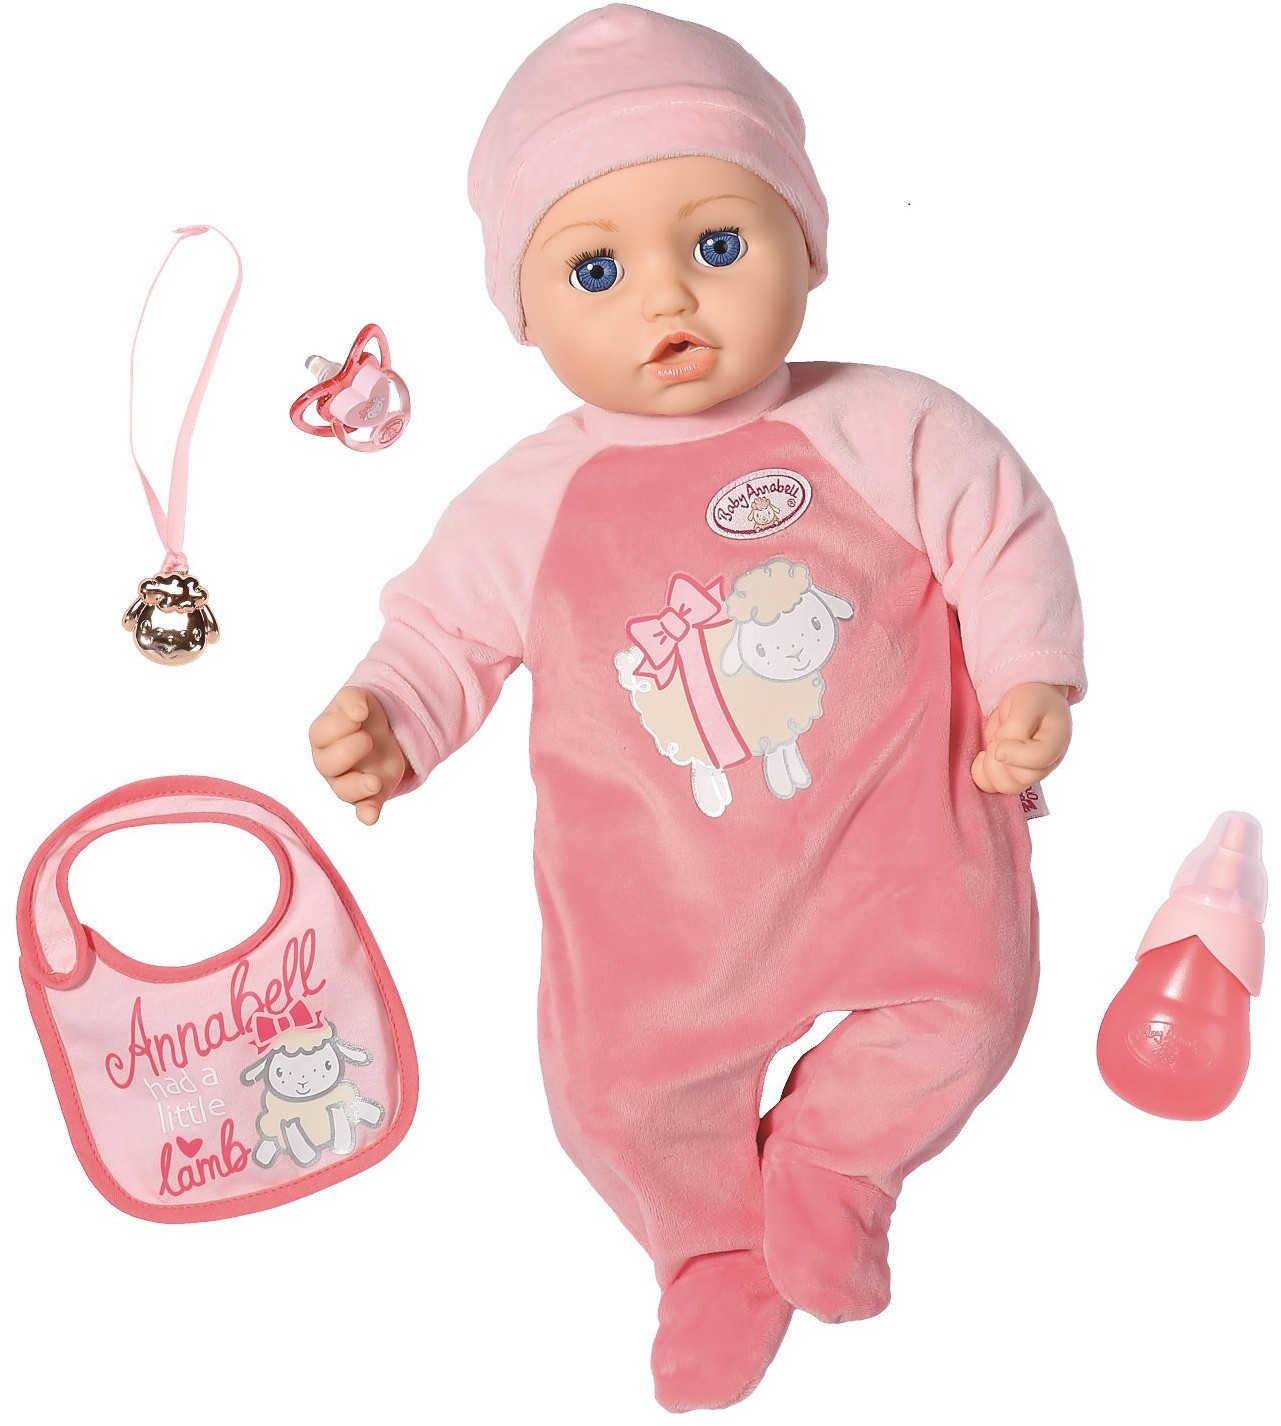 Zapf Creation Creation Baby Annabell Lalka z akcesoriami 46 cm